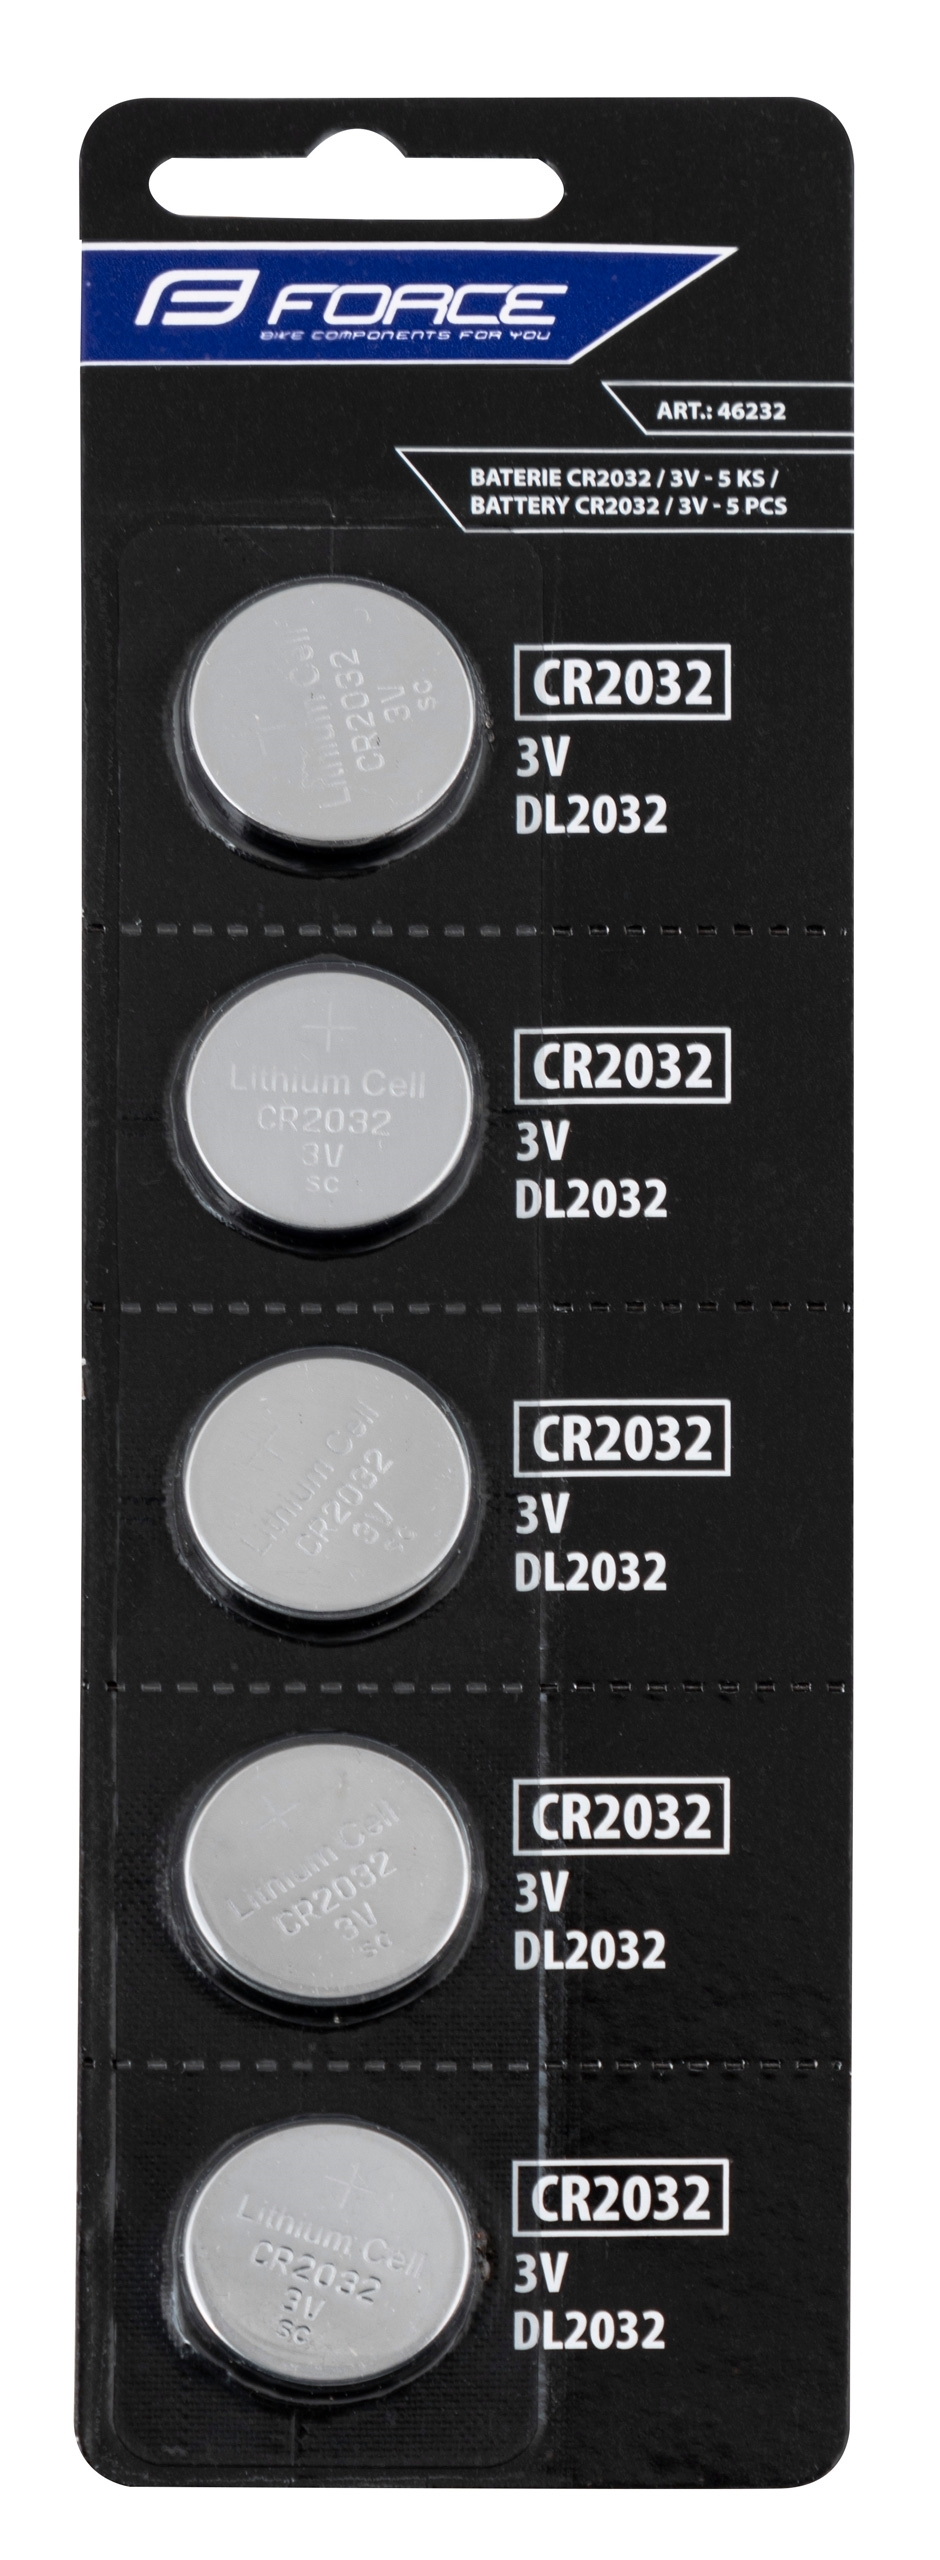 baterie FORCE mincové CR2032 / 3V 1 x 5 ks